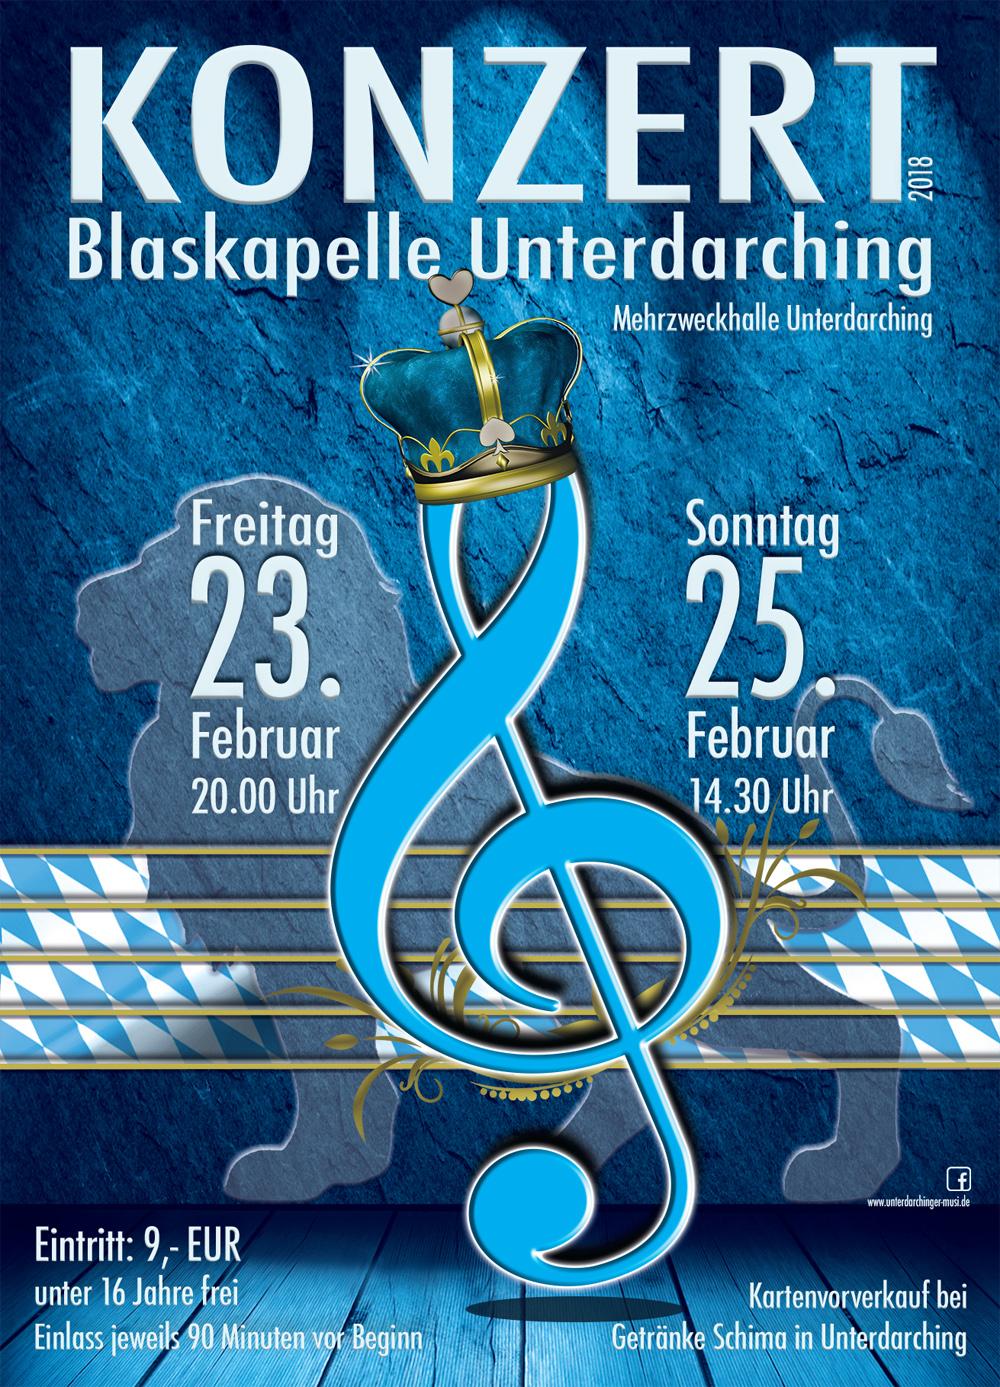 Konzert Blaskapelle Unterdarching Plakat 2018